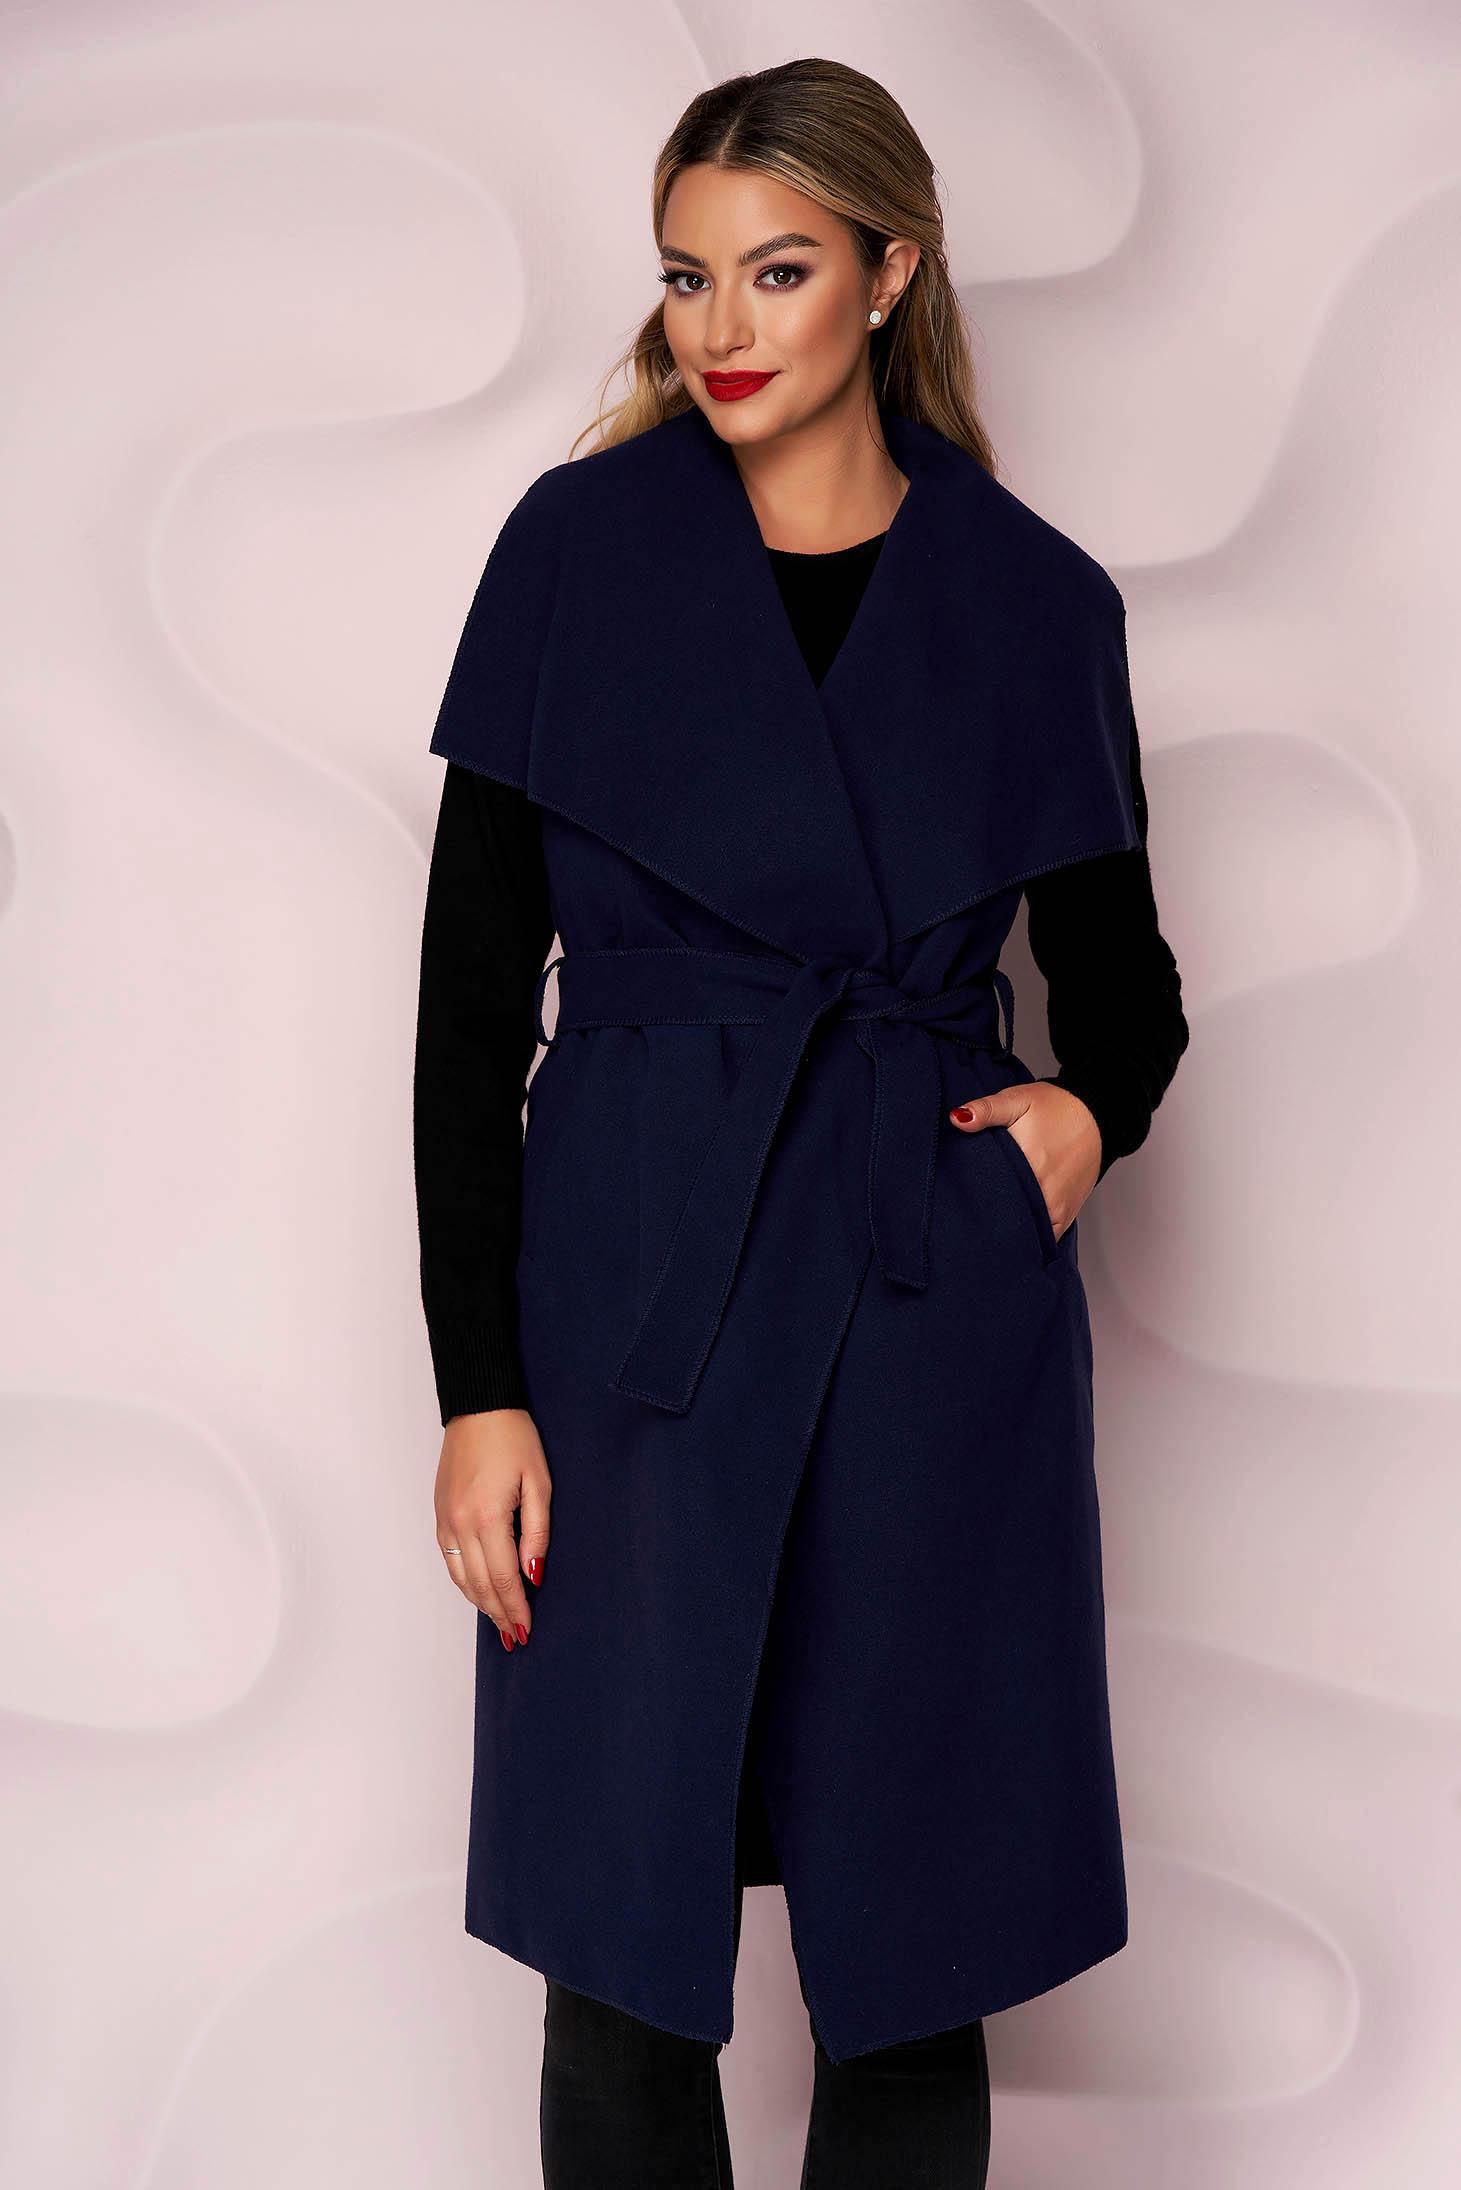 Vesta SunShine albastru-inchis casual cu buzunare din material gros si fin la atingere si cordon detasabil